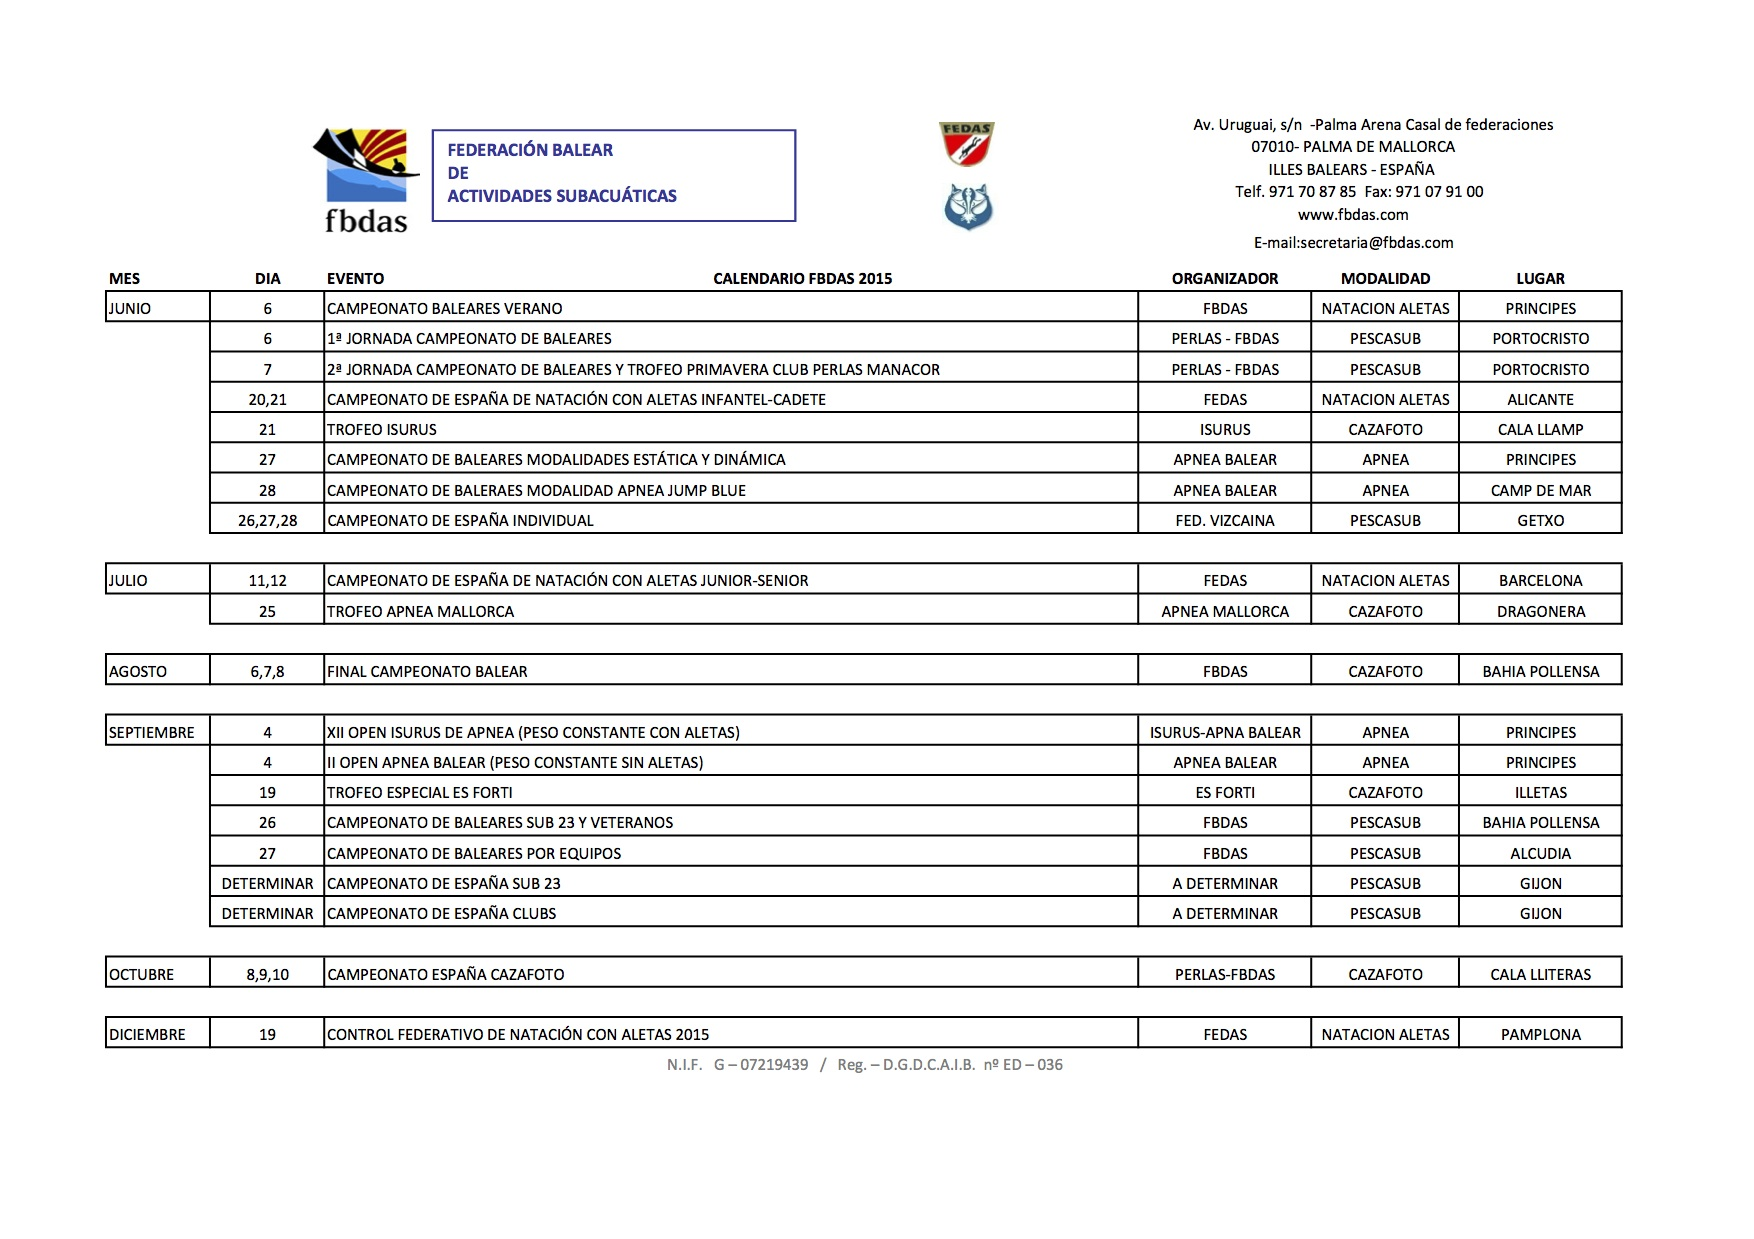 CALENDARIO 2015 GENERAL ULTIMO